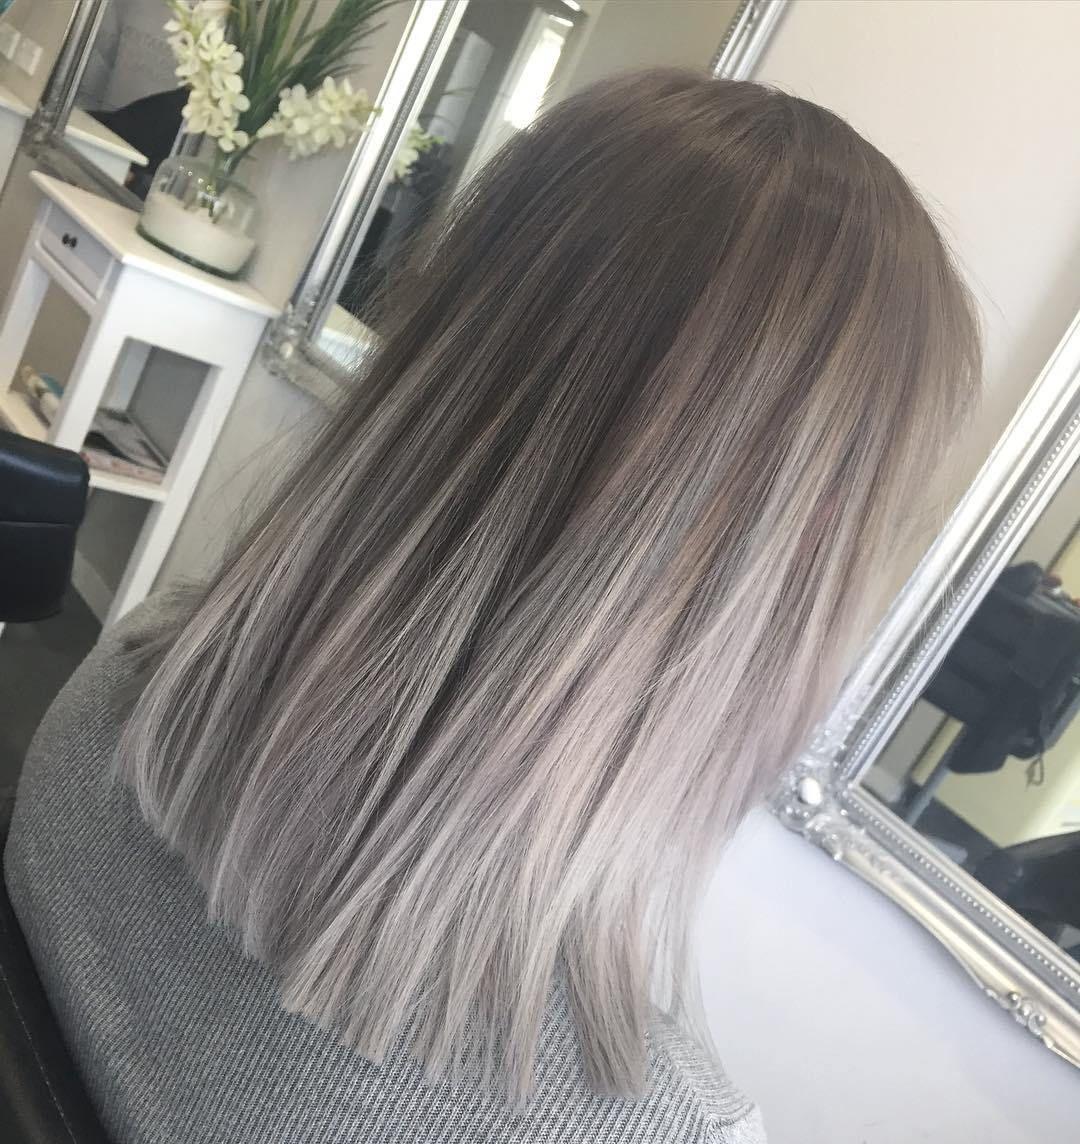 70 Flattering Balayage Hair Color Ideas For 2020 Hair Styles Hair Color Hair Shows